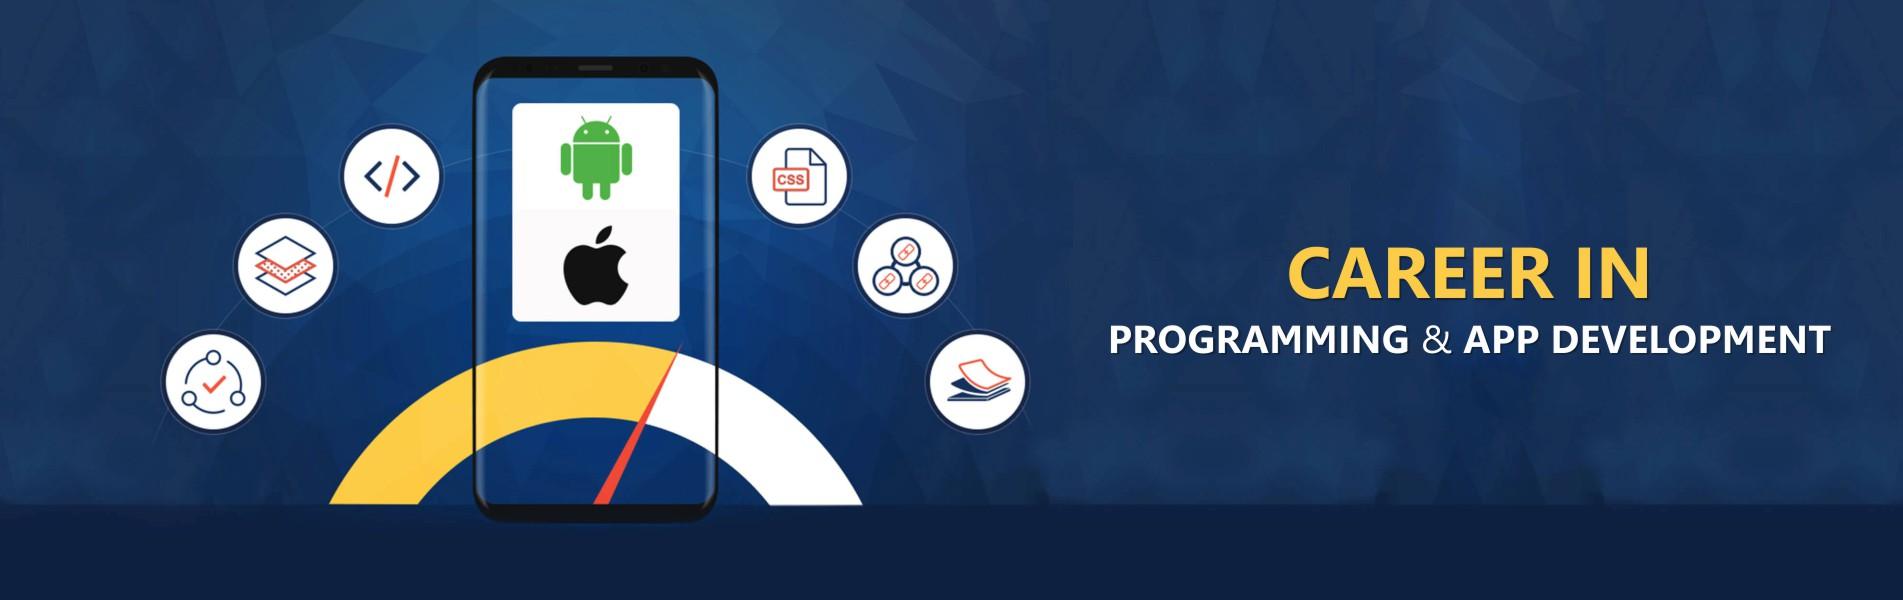 Career-in-Programming-App-Development